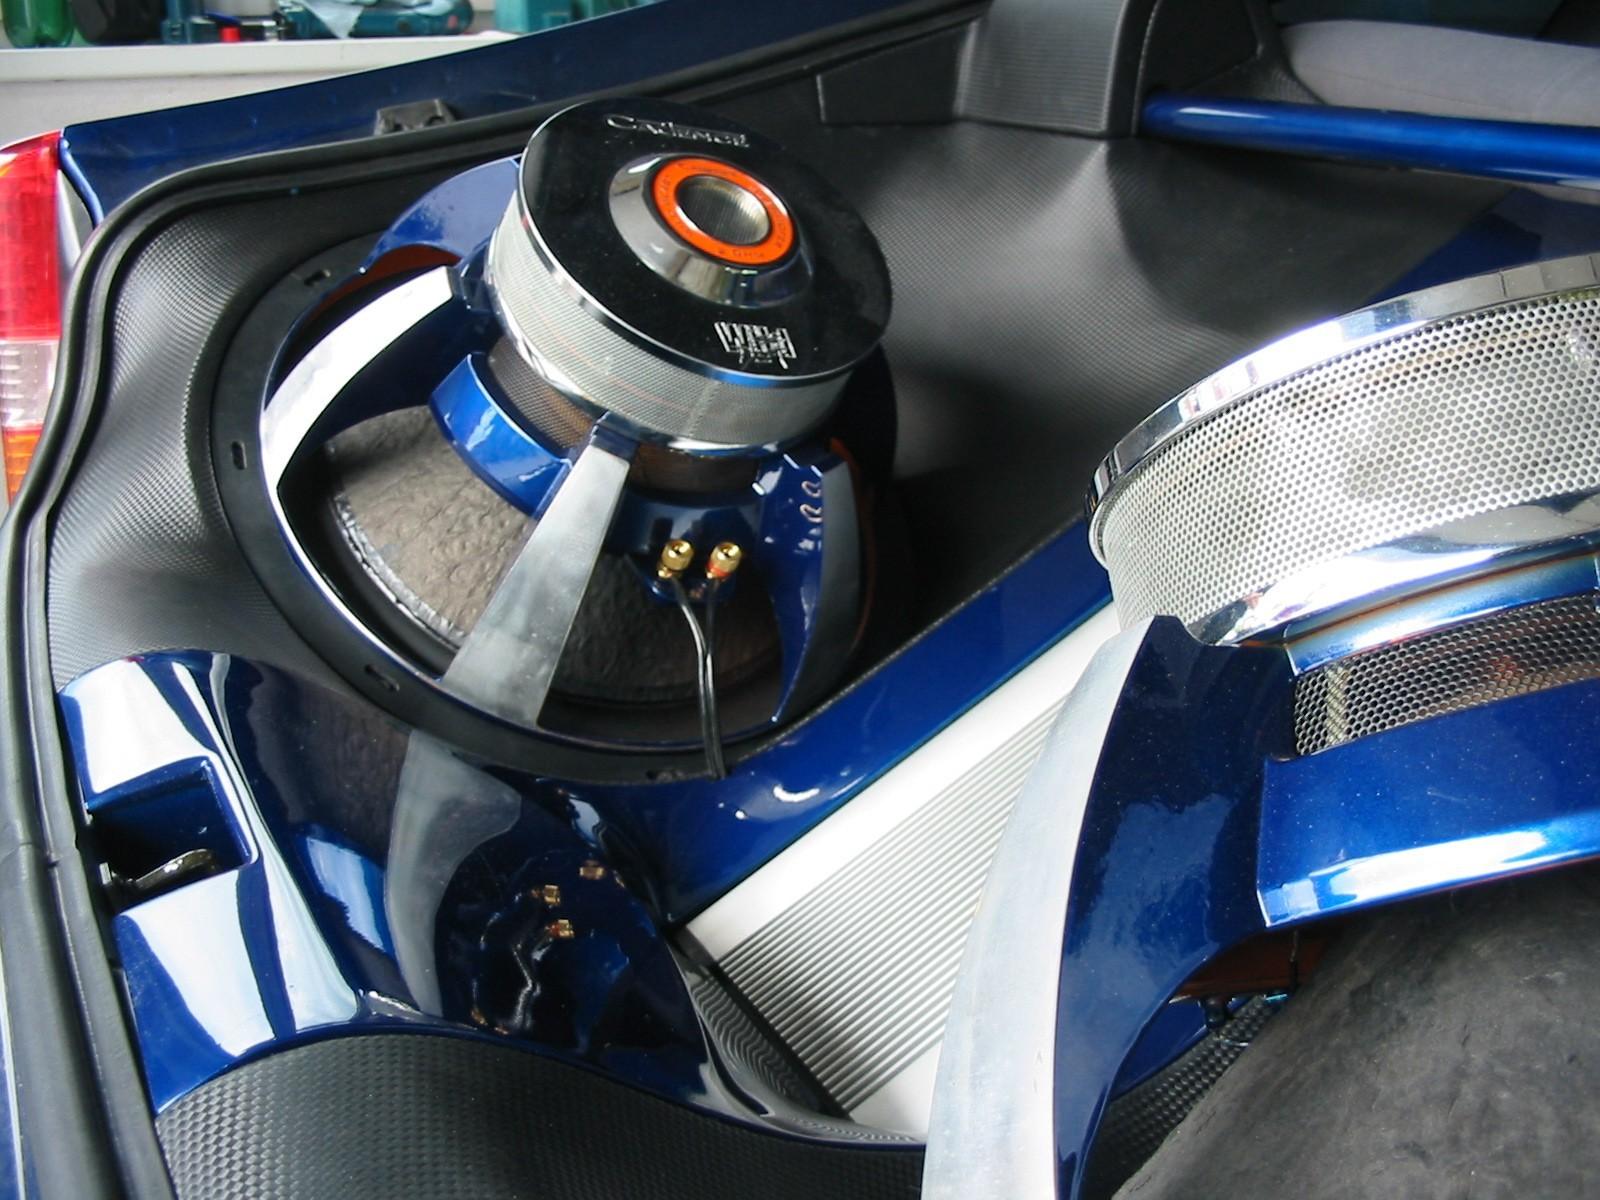 Toyota Celica (T23) - Kofferraumverbau im Carbon-Look